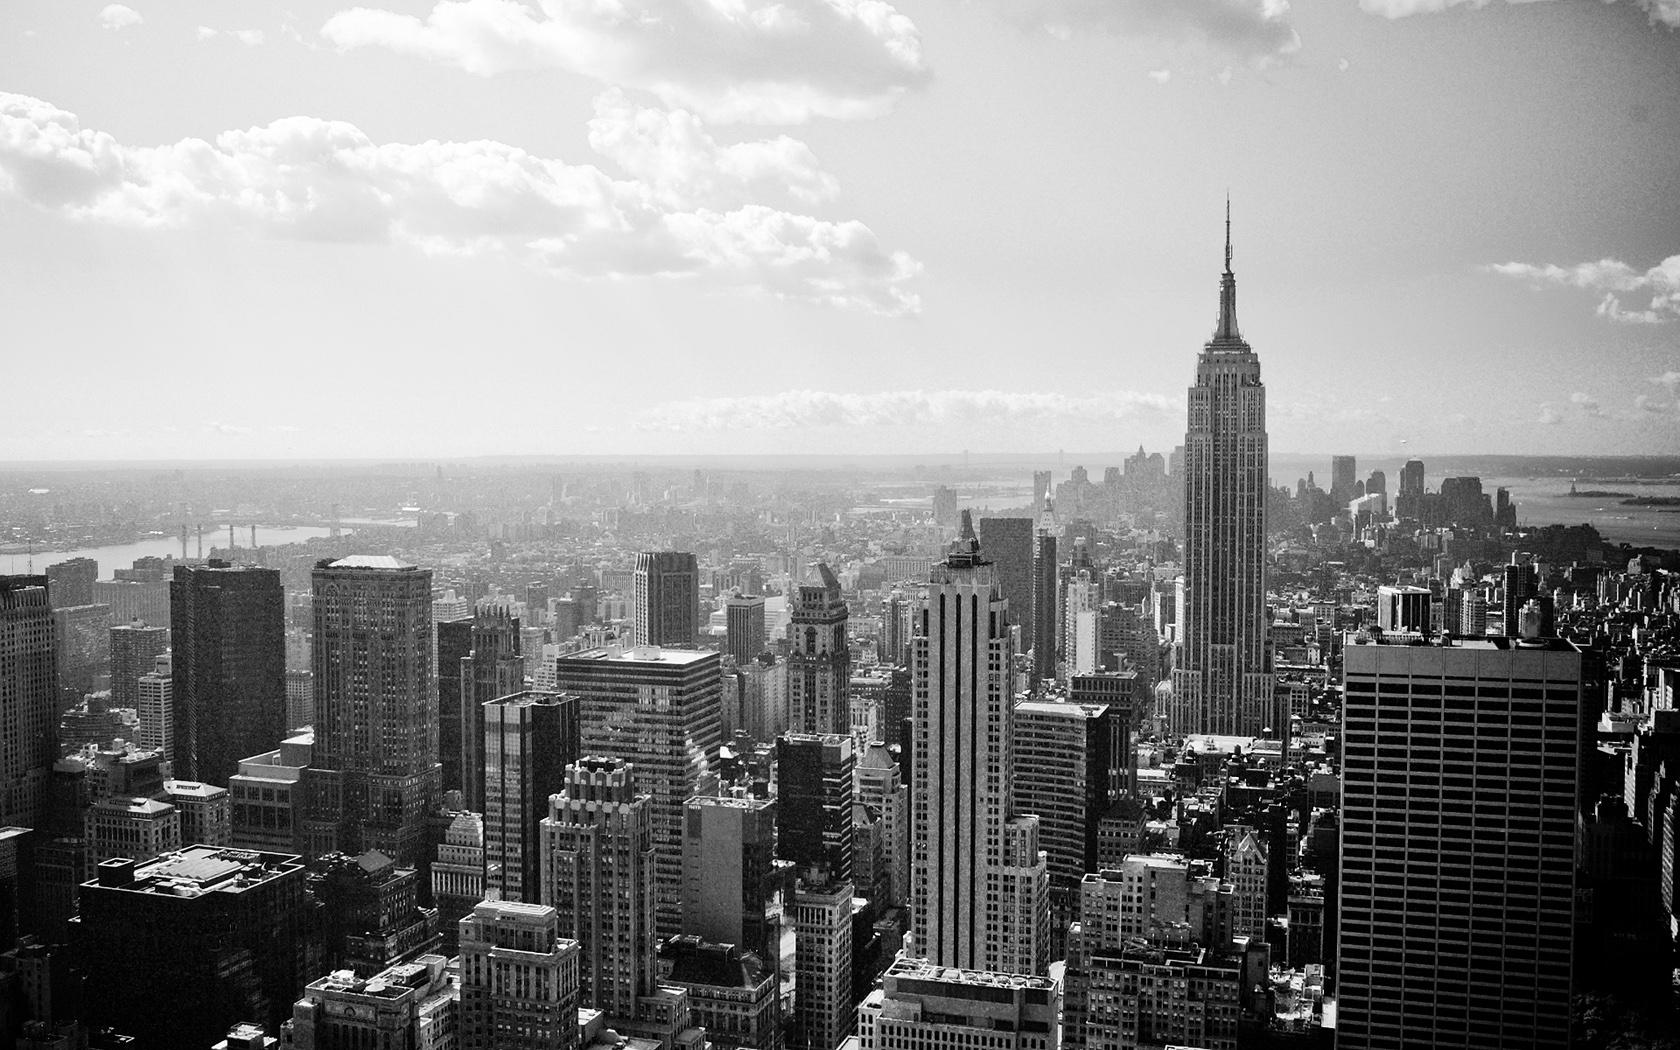 New York Black And White Wallpaper 1680x1050 pixel Popular HD 1680x1050